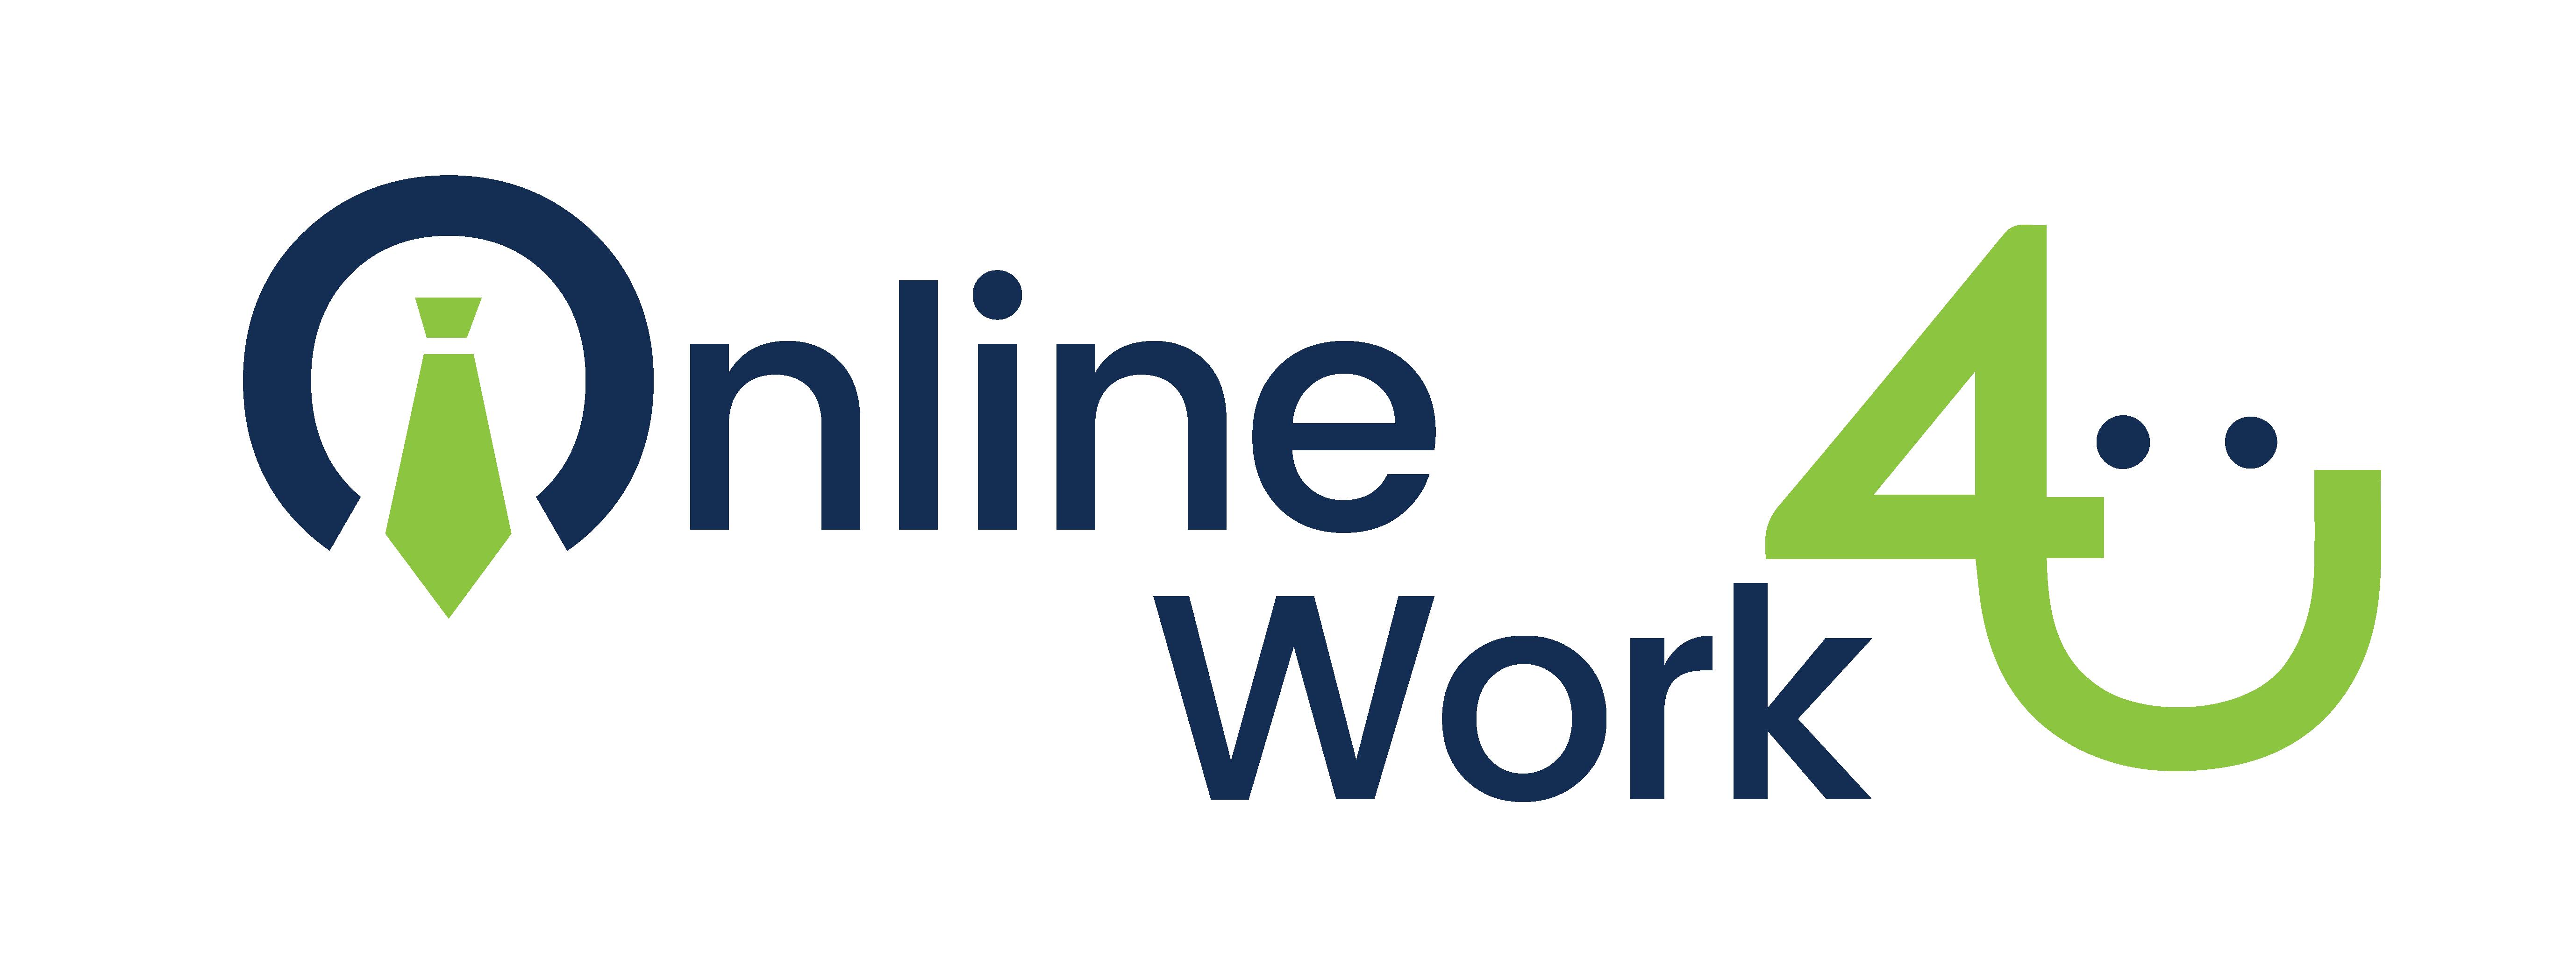 Online Works 4 U